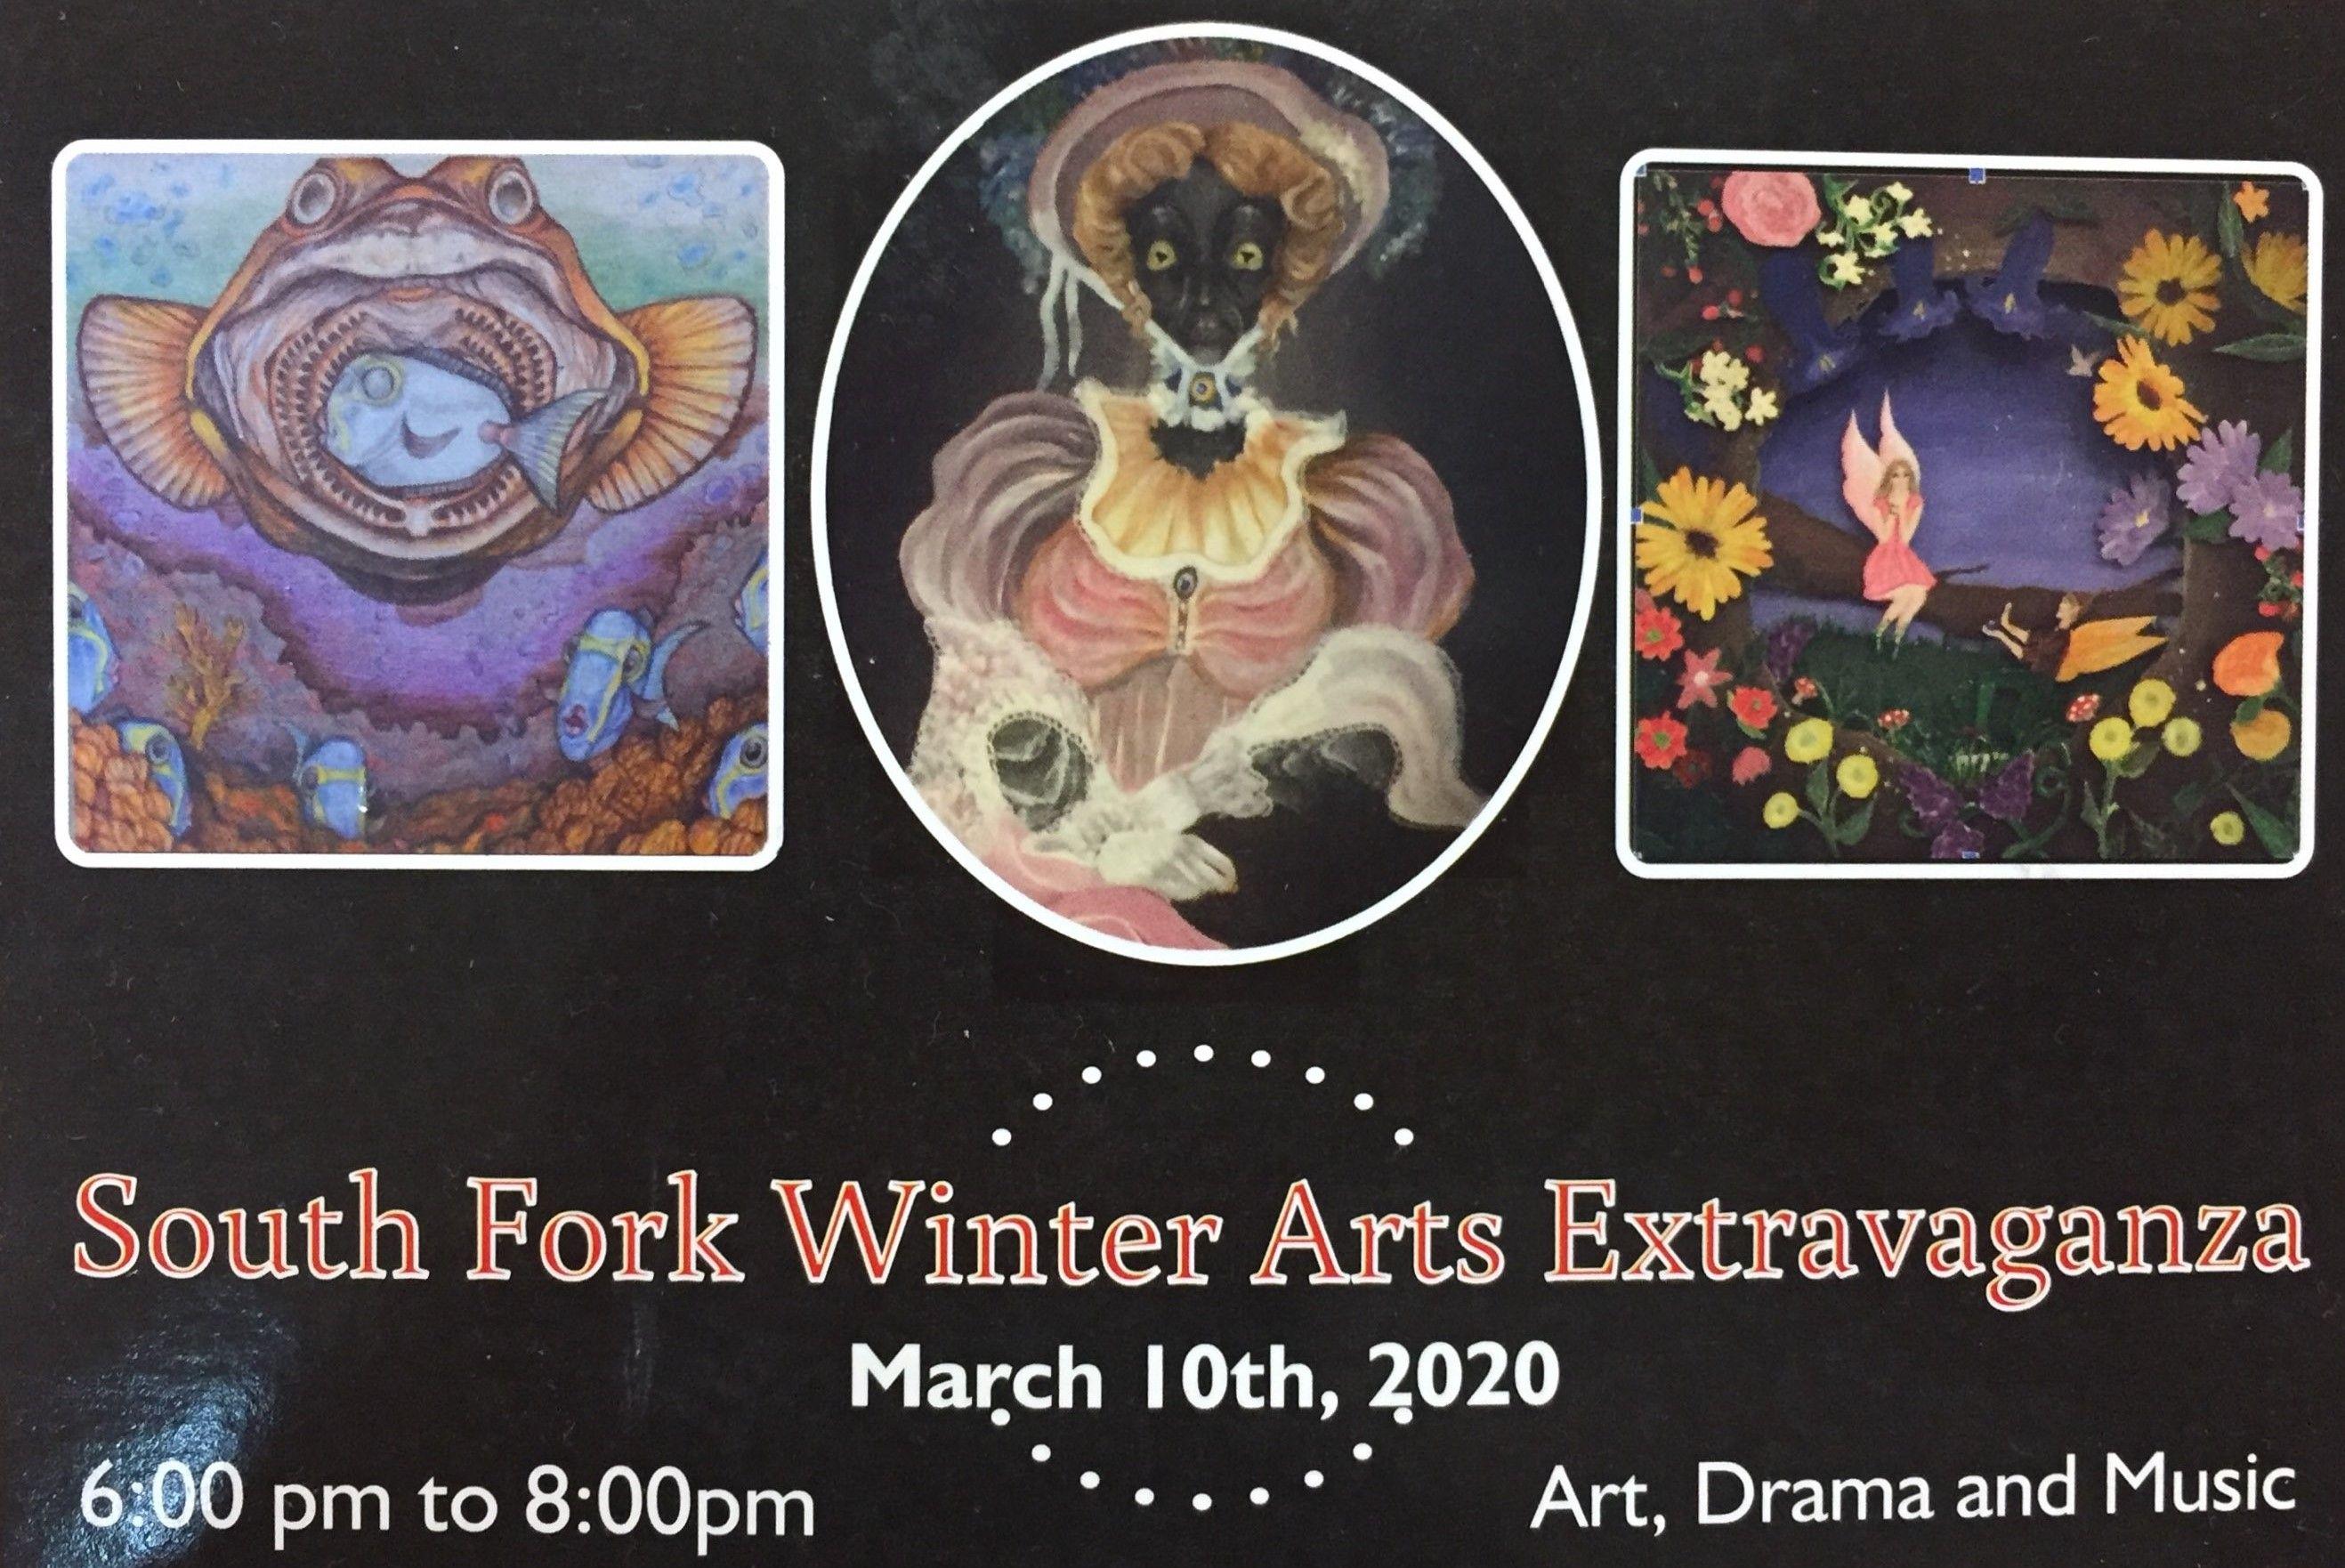 South Fork High School Winter Arts Extravaganza